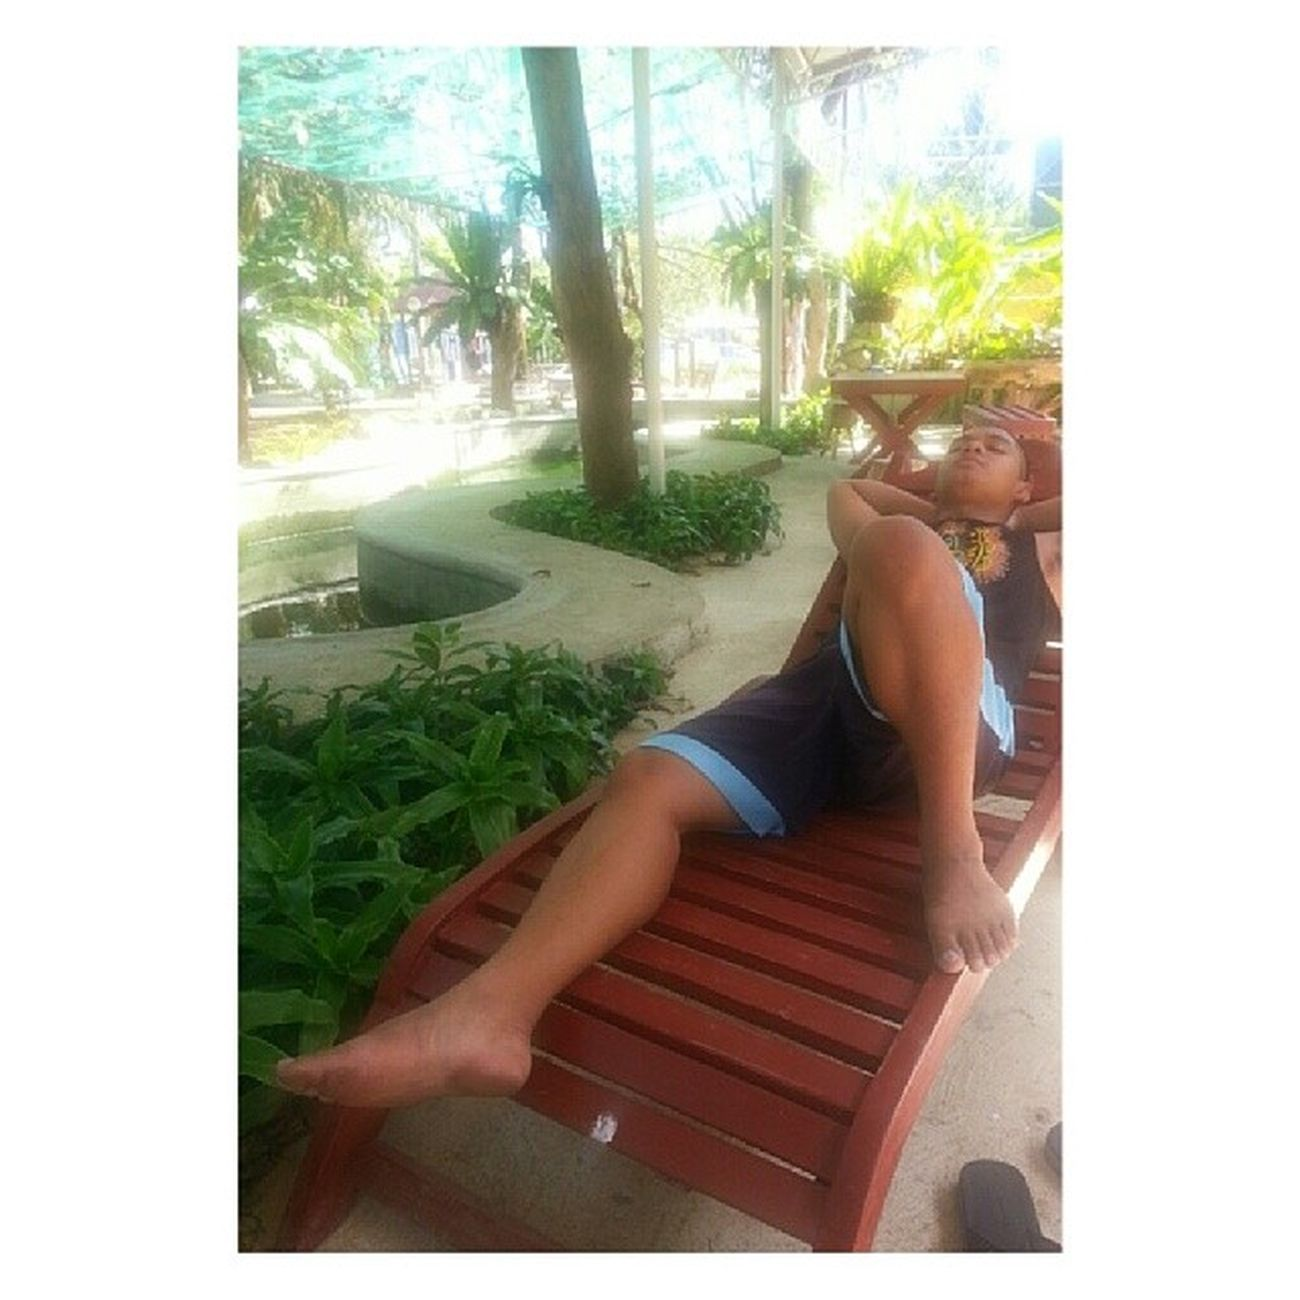 Sun bathing? No. He was sleeping! Excited man gud mag swimming mao walay tug. :p ✌Summer March